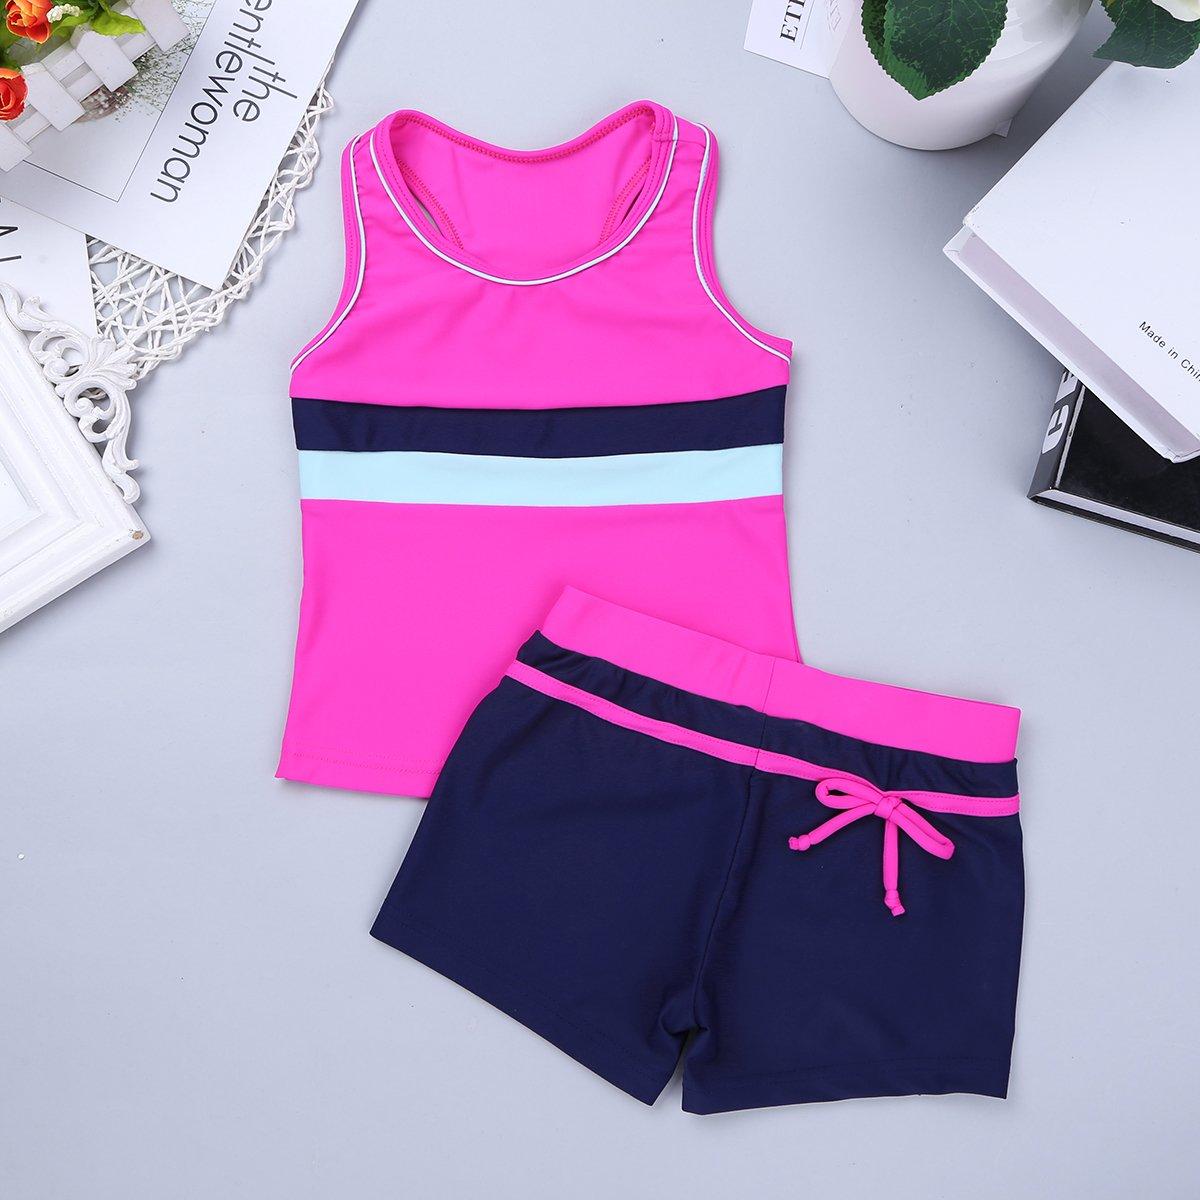 iiniim Little Girls Kids Summer Two Piece Boyshort Tops Tankini Kids Swimsuit Swimwear Set